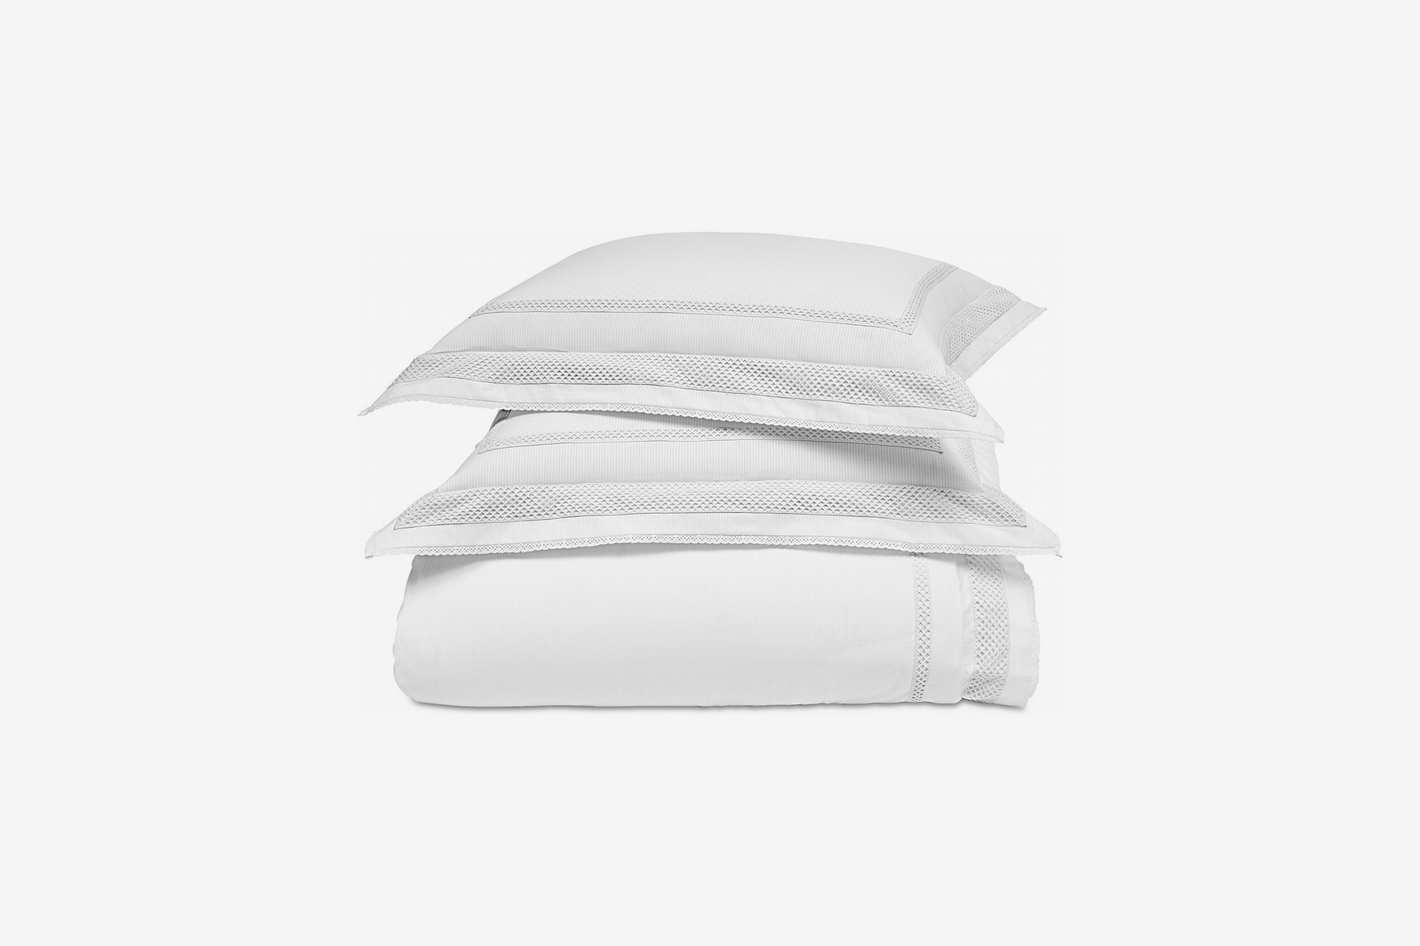 Martha Stewart Collection Signature Lattice Cotton 200-Thread Count 3-Pc. Full/Queen Duvet Set